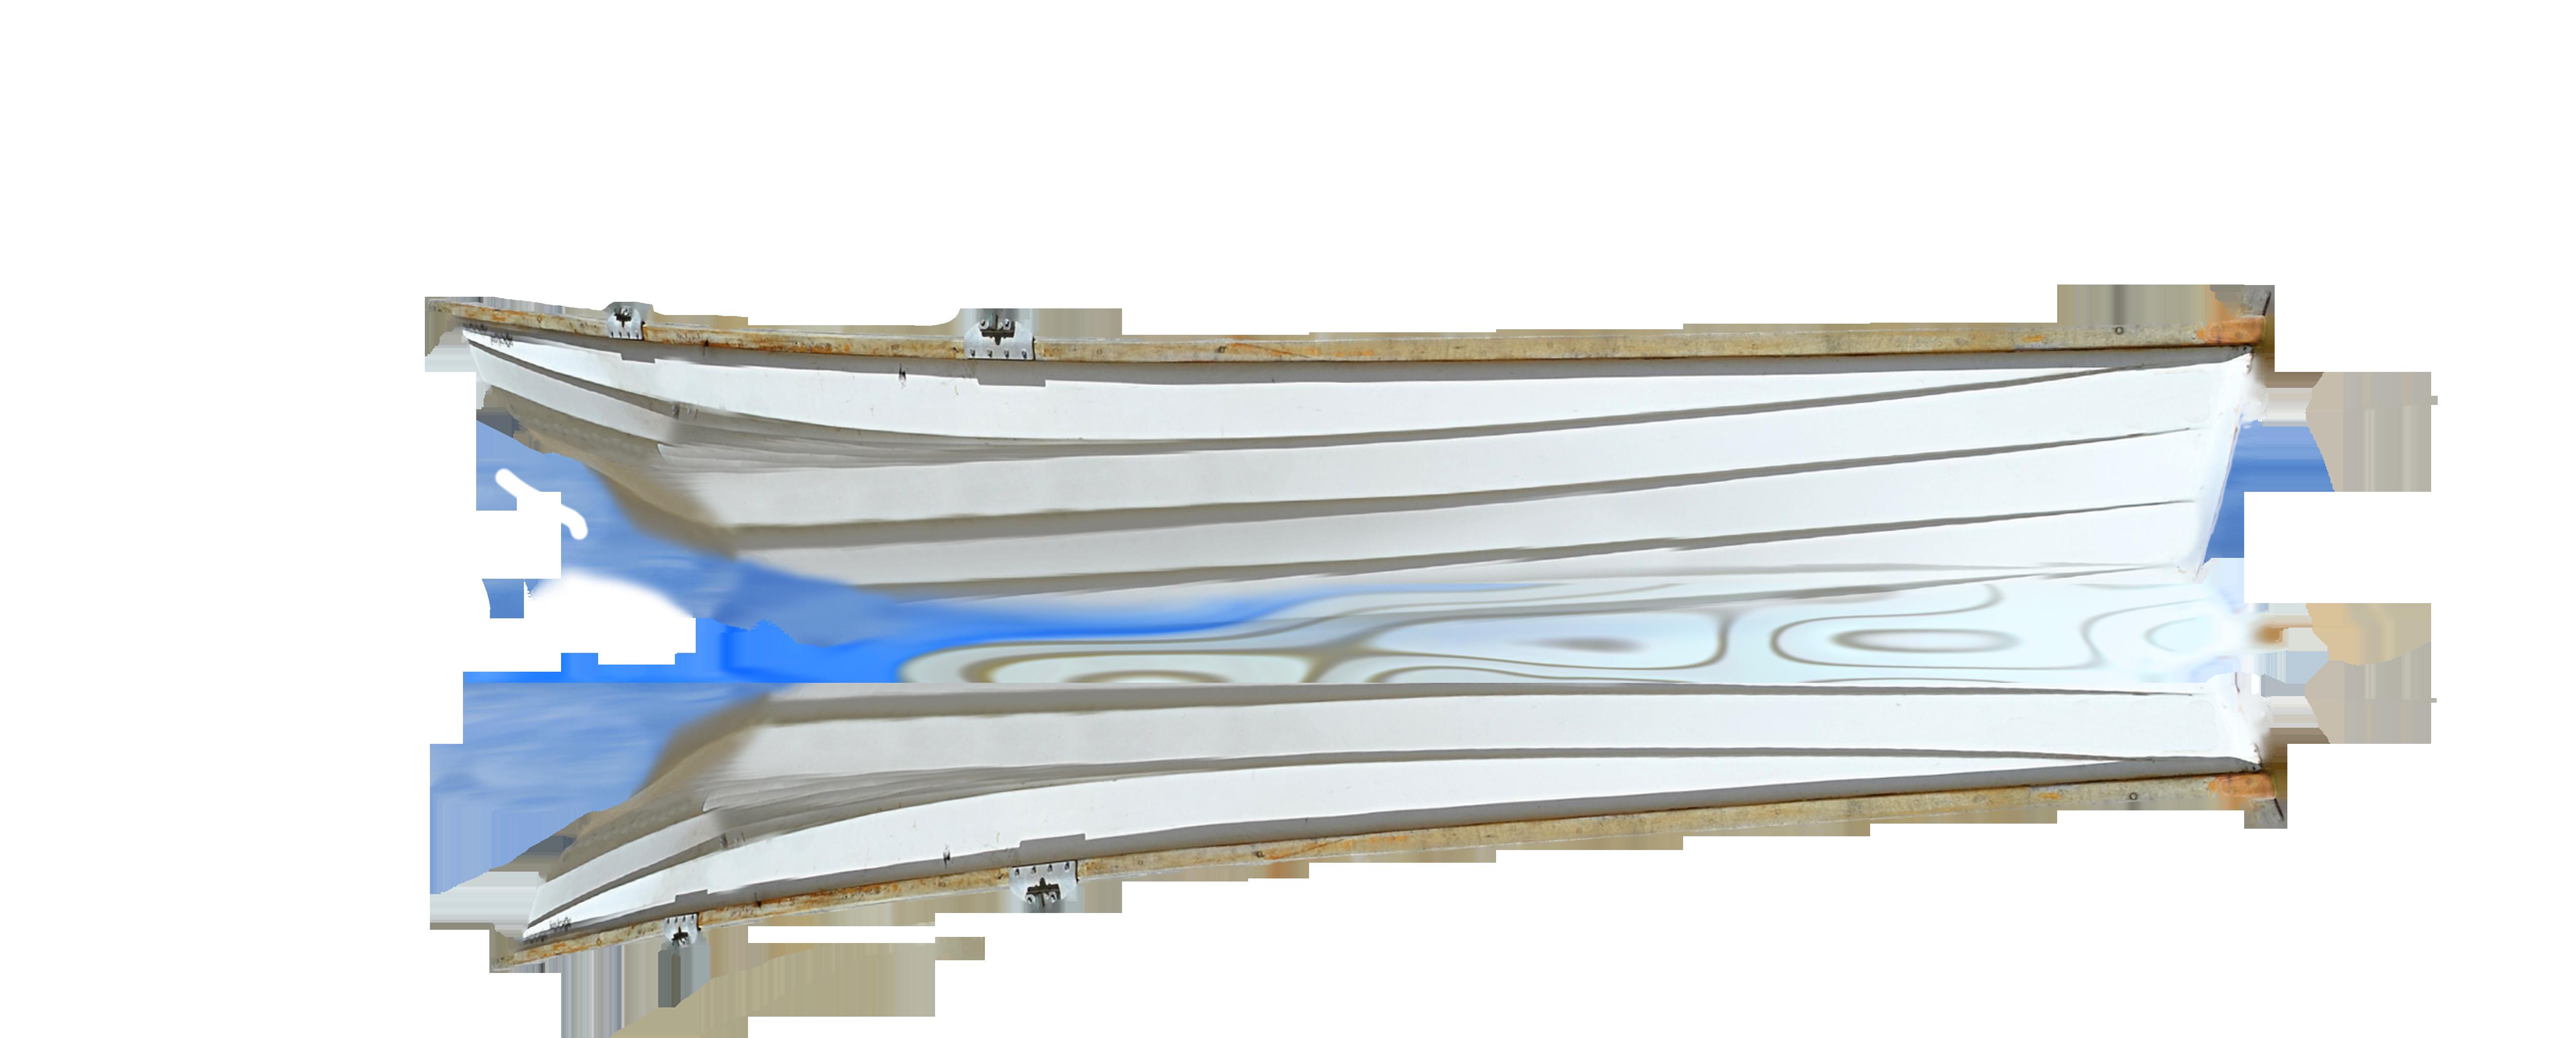 Download free png transparent. Clipart boat ski boat